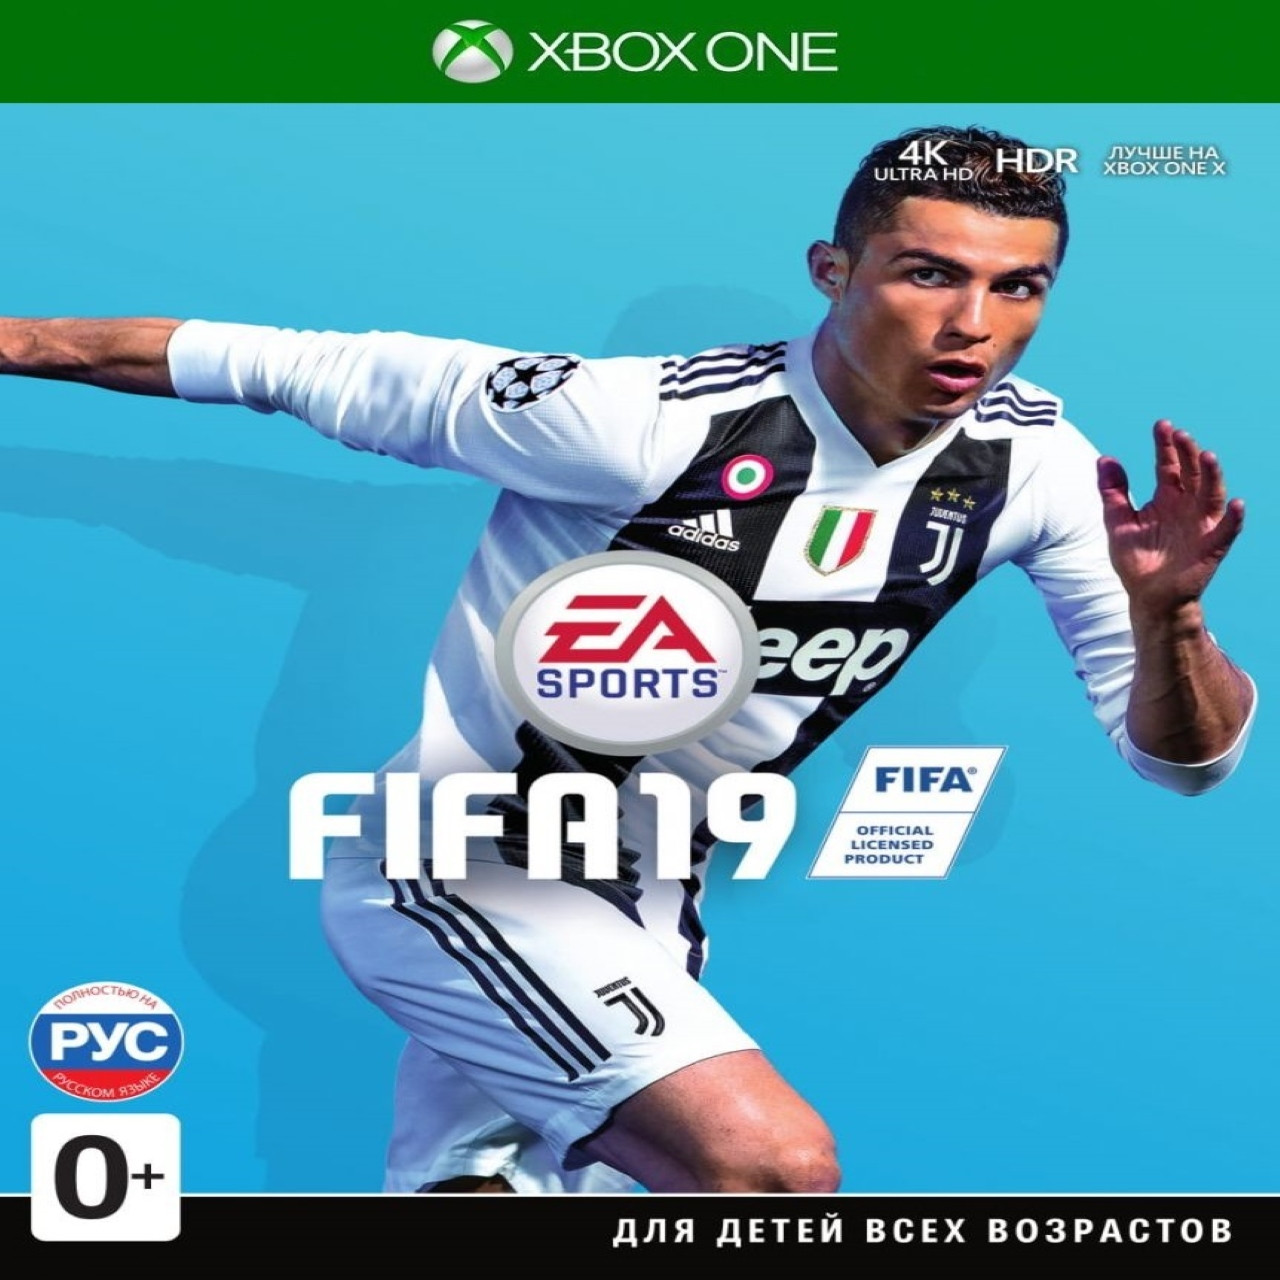 FIFA 19 RUS XBOX ONE